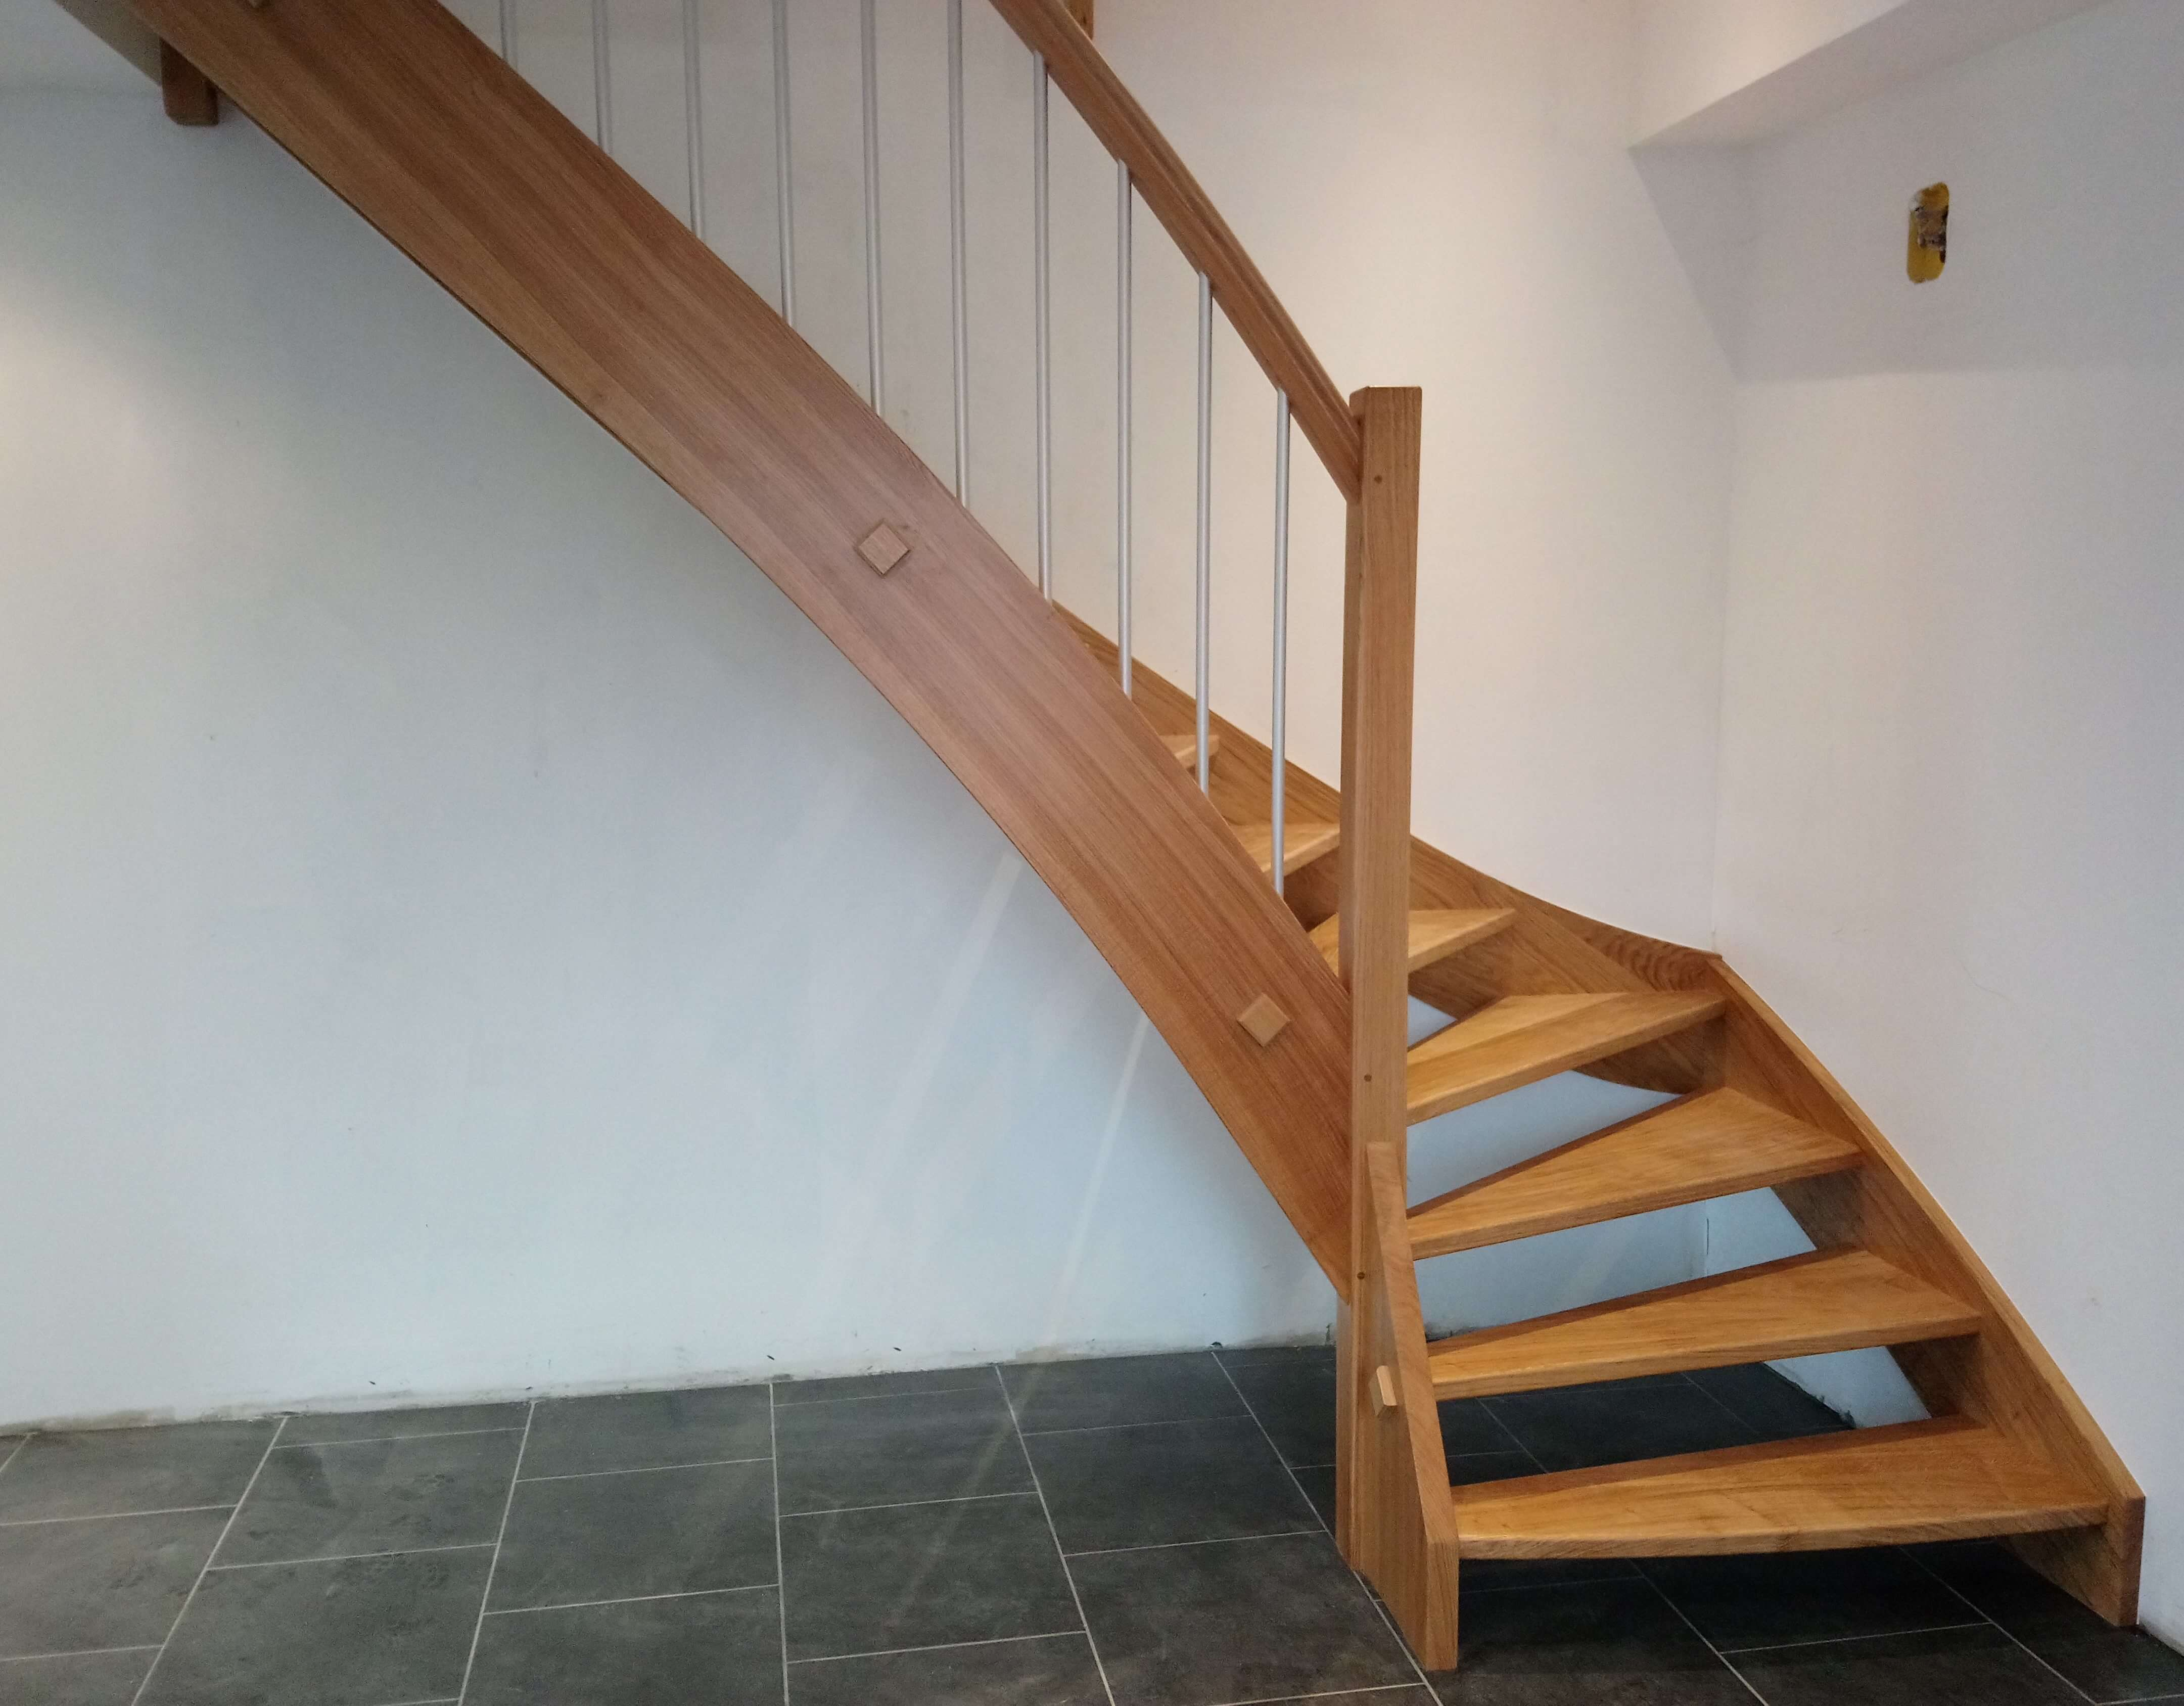 Menuiserie Figard - Fabrication sur mesure - Escalier 1/4 tournant - Chêne alu - Vesoul